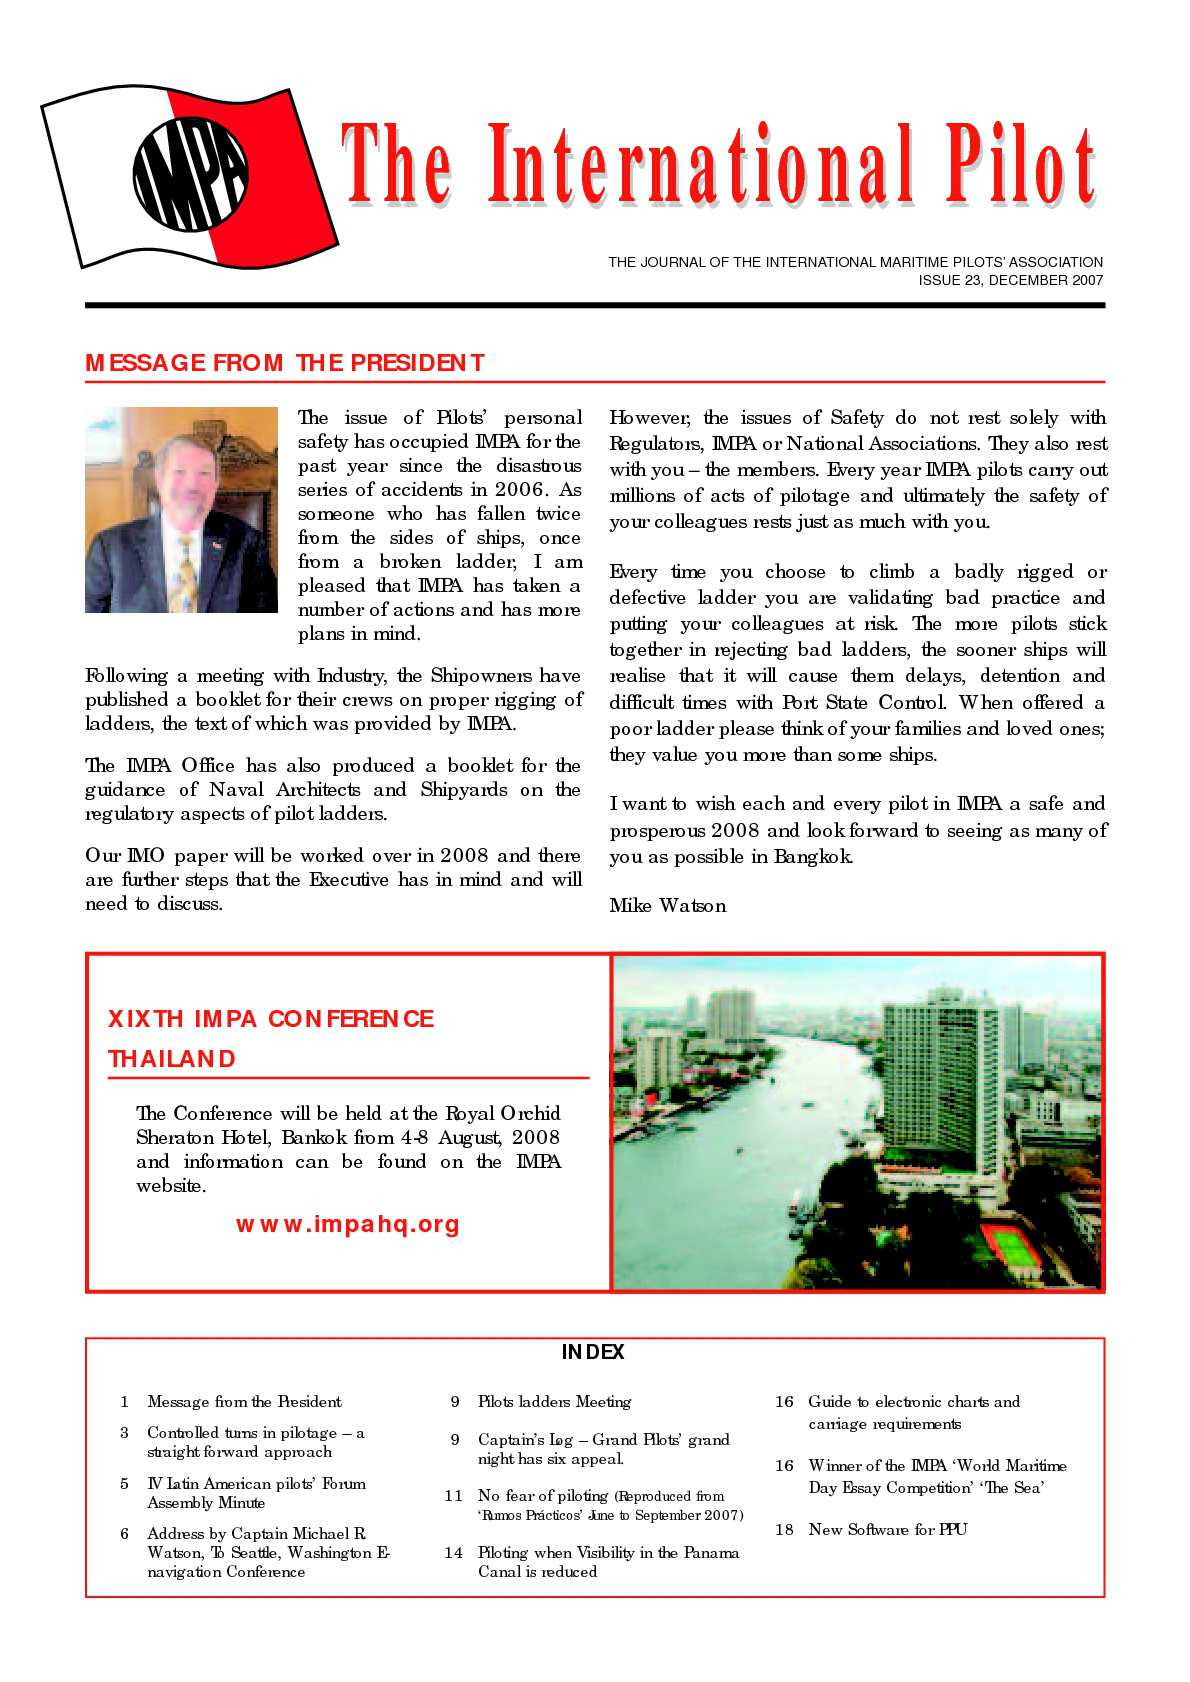 Calaméo - International Pilot - Issue 23